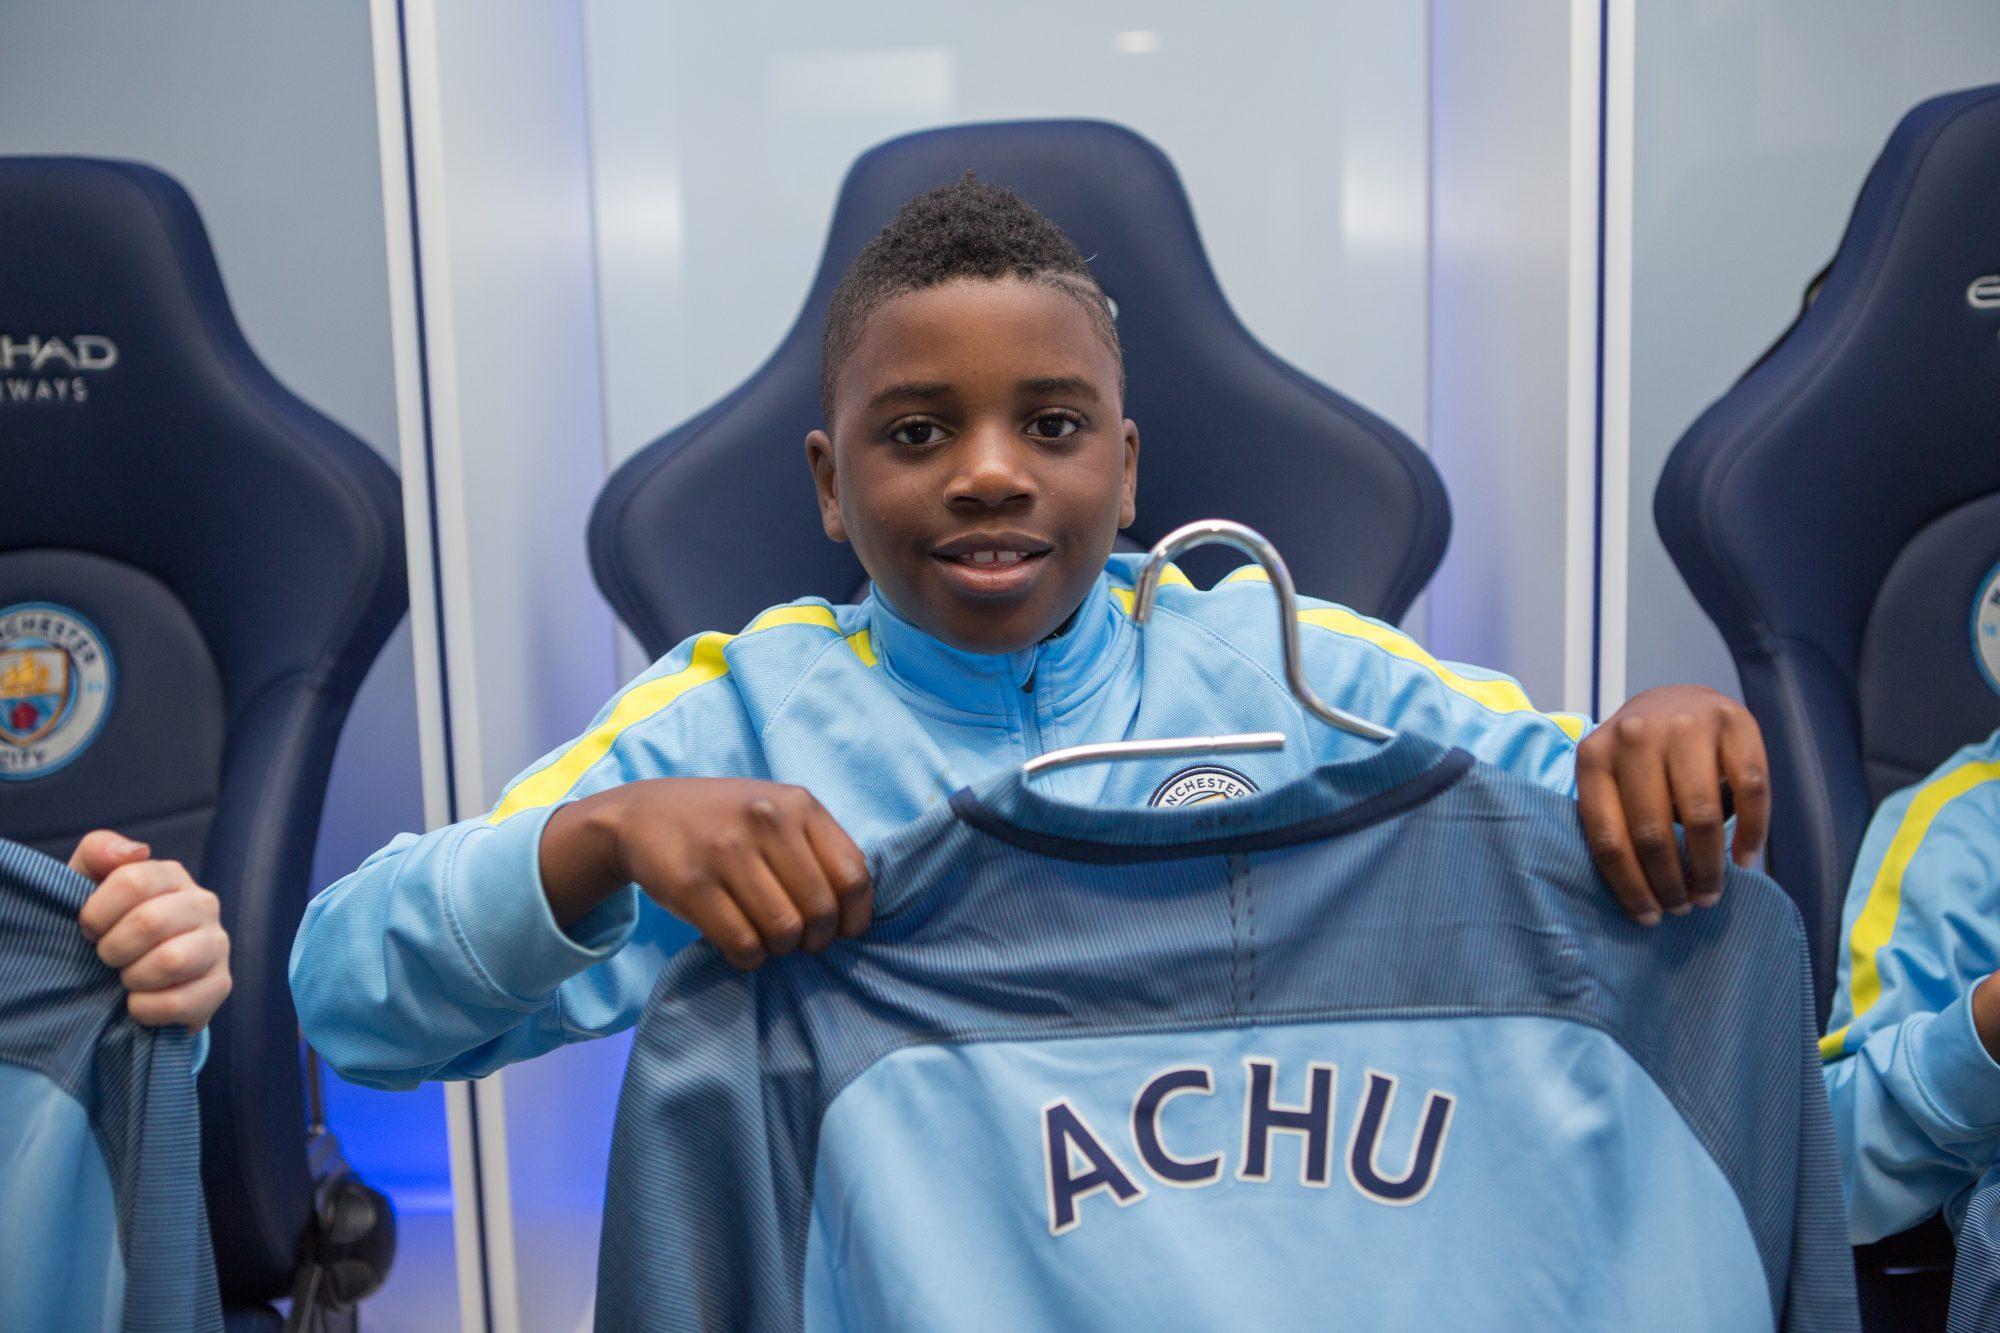 British Born Cameroonian Tristan Achu